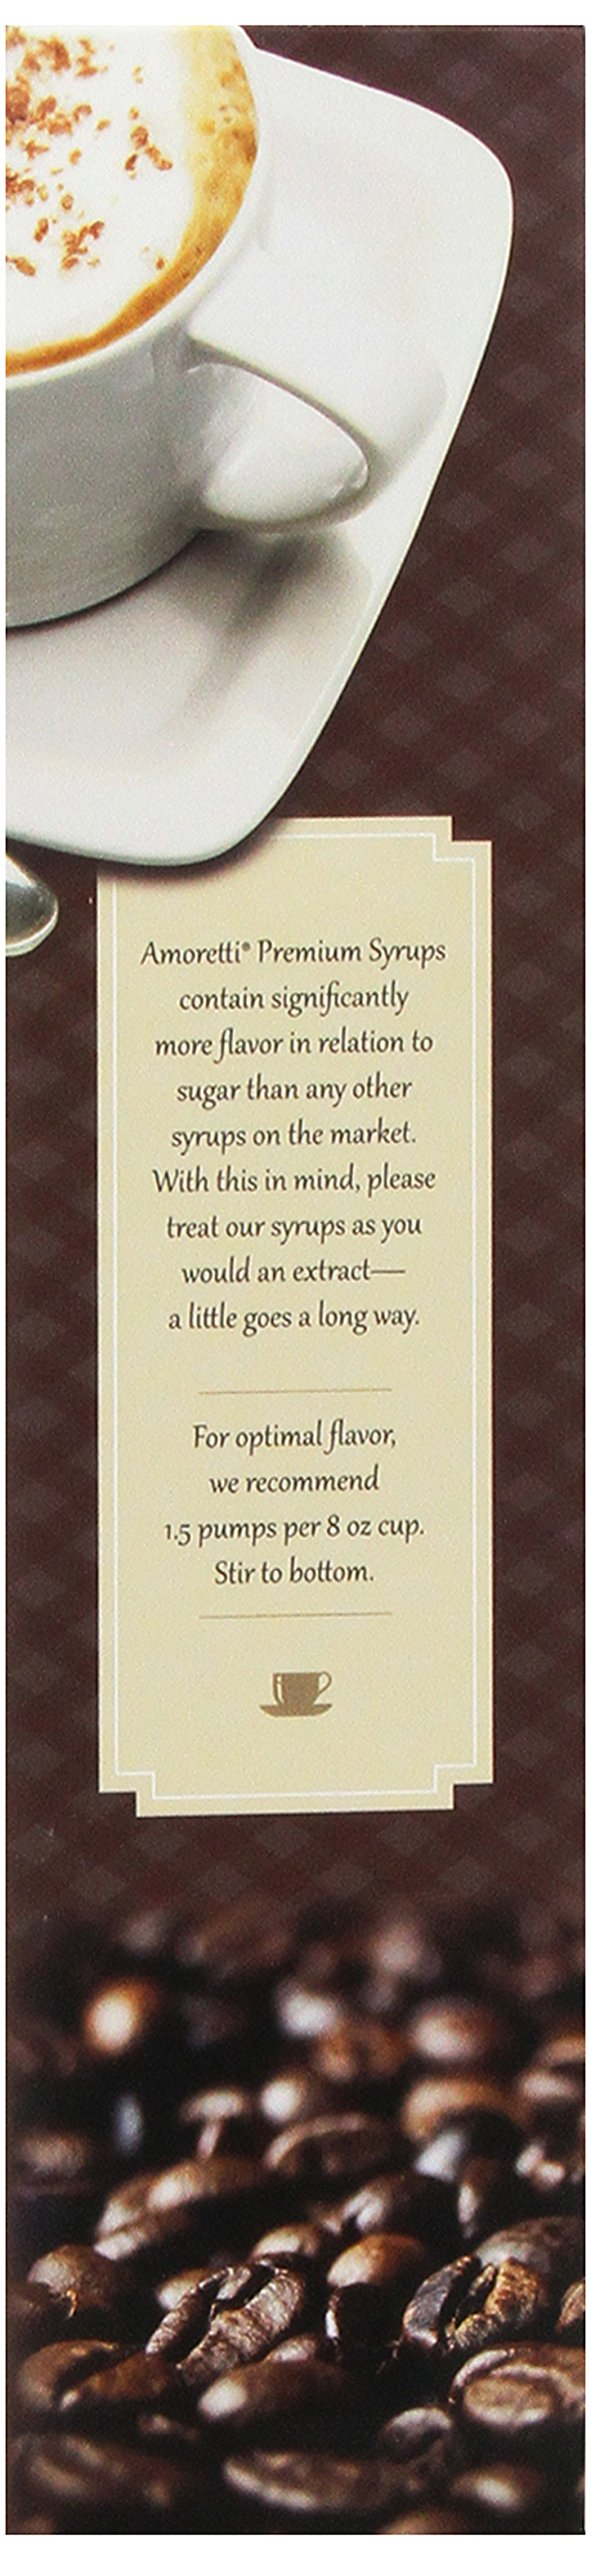 Amoretti Premium Caramel Syrup 750ml 3 Pack by Amoretti (Image #4)